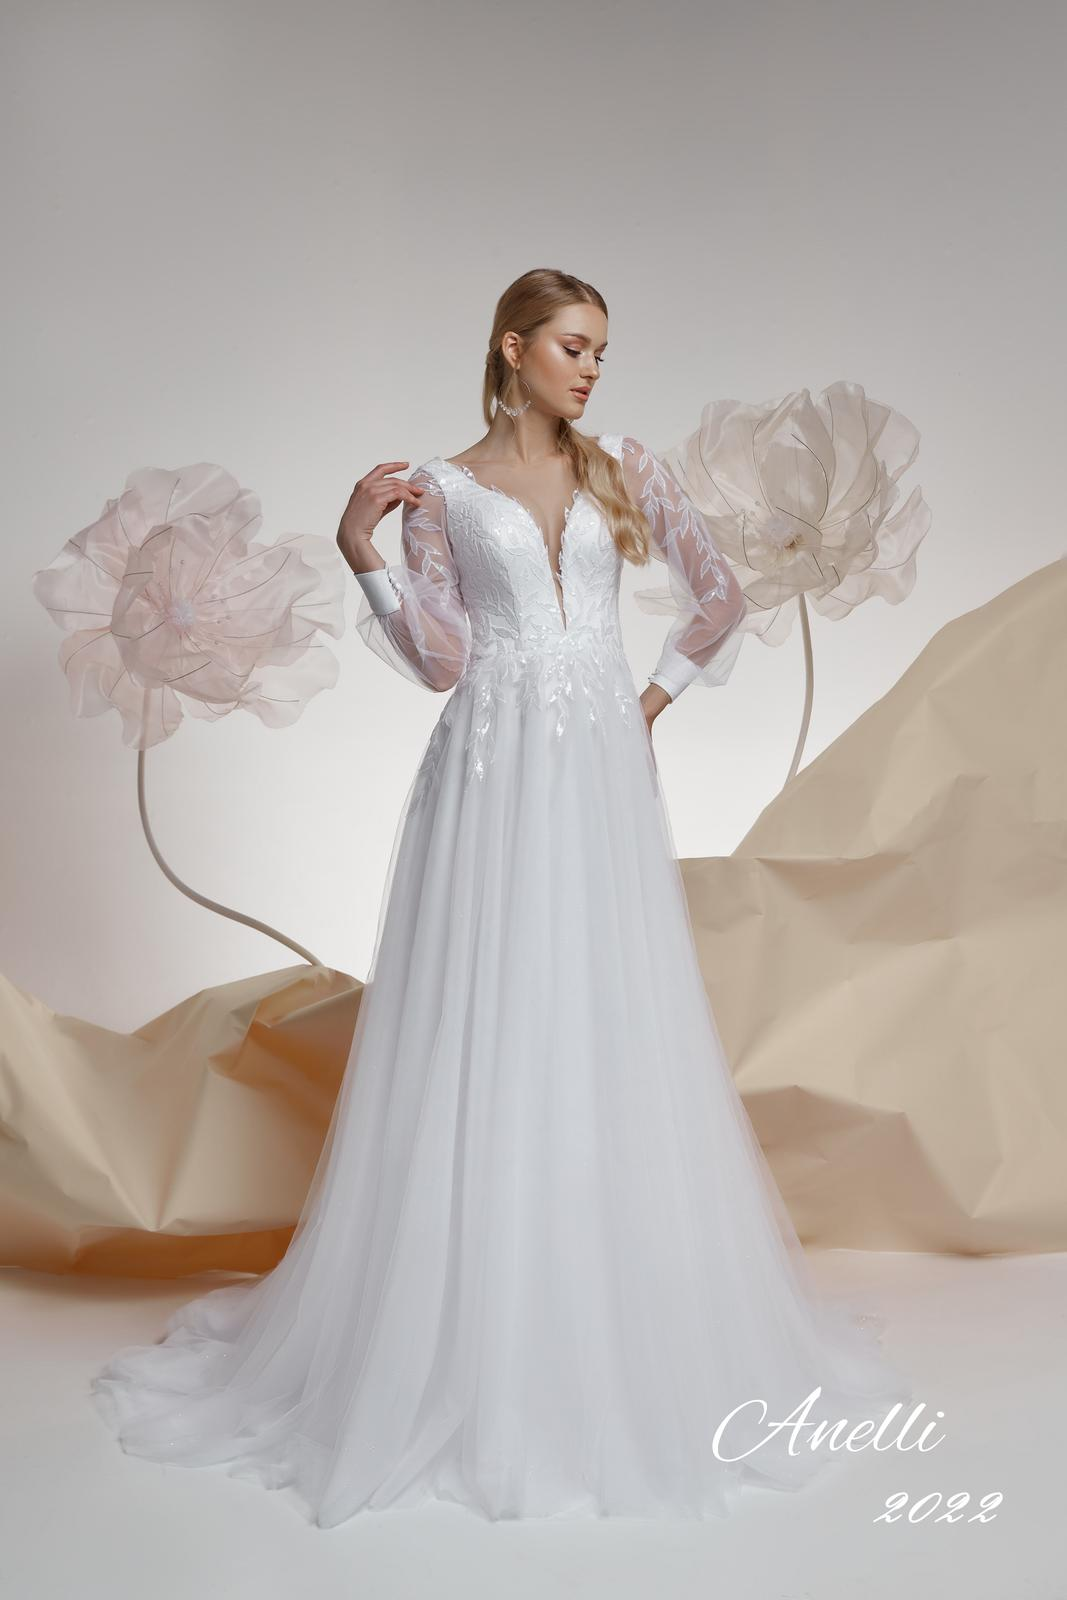 Svadobné šaty - Imagine 2022 - Obrázok č. 1